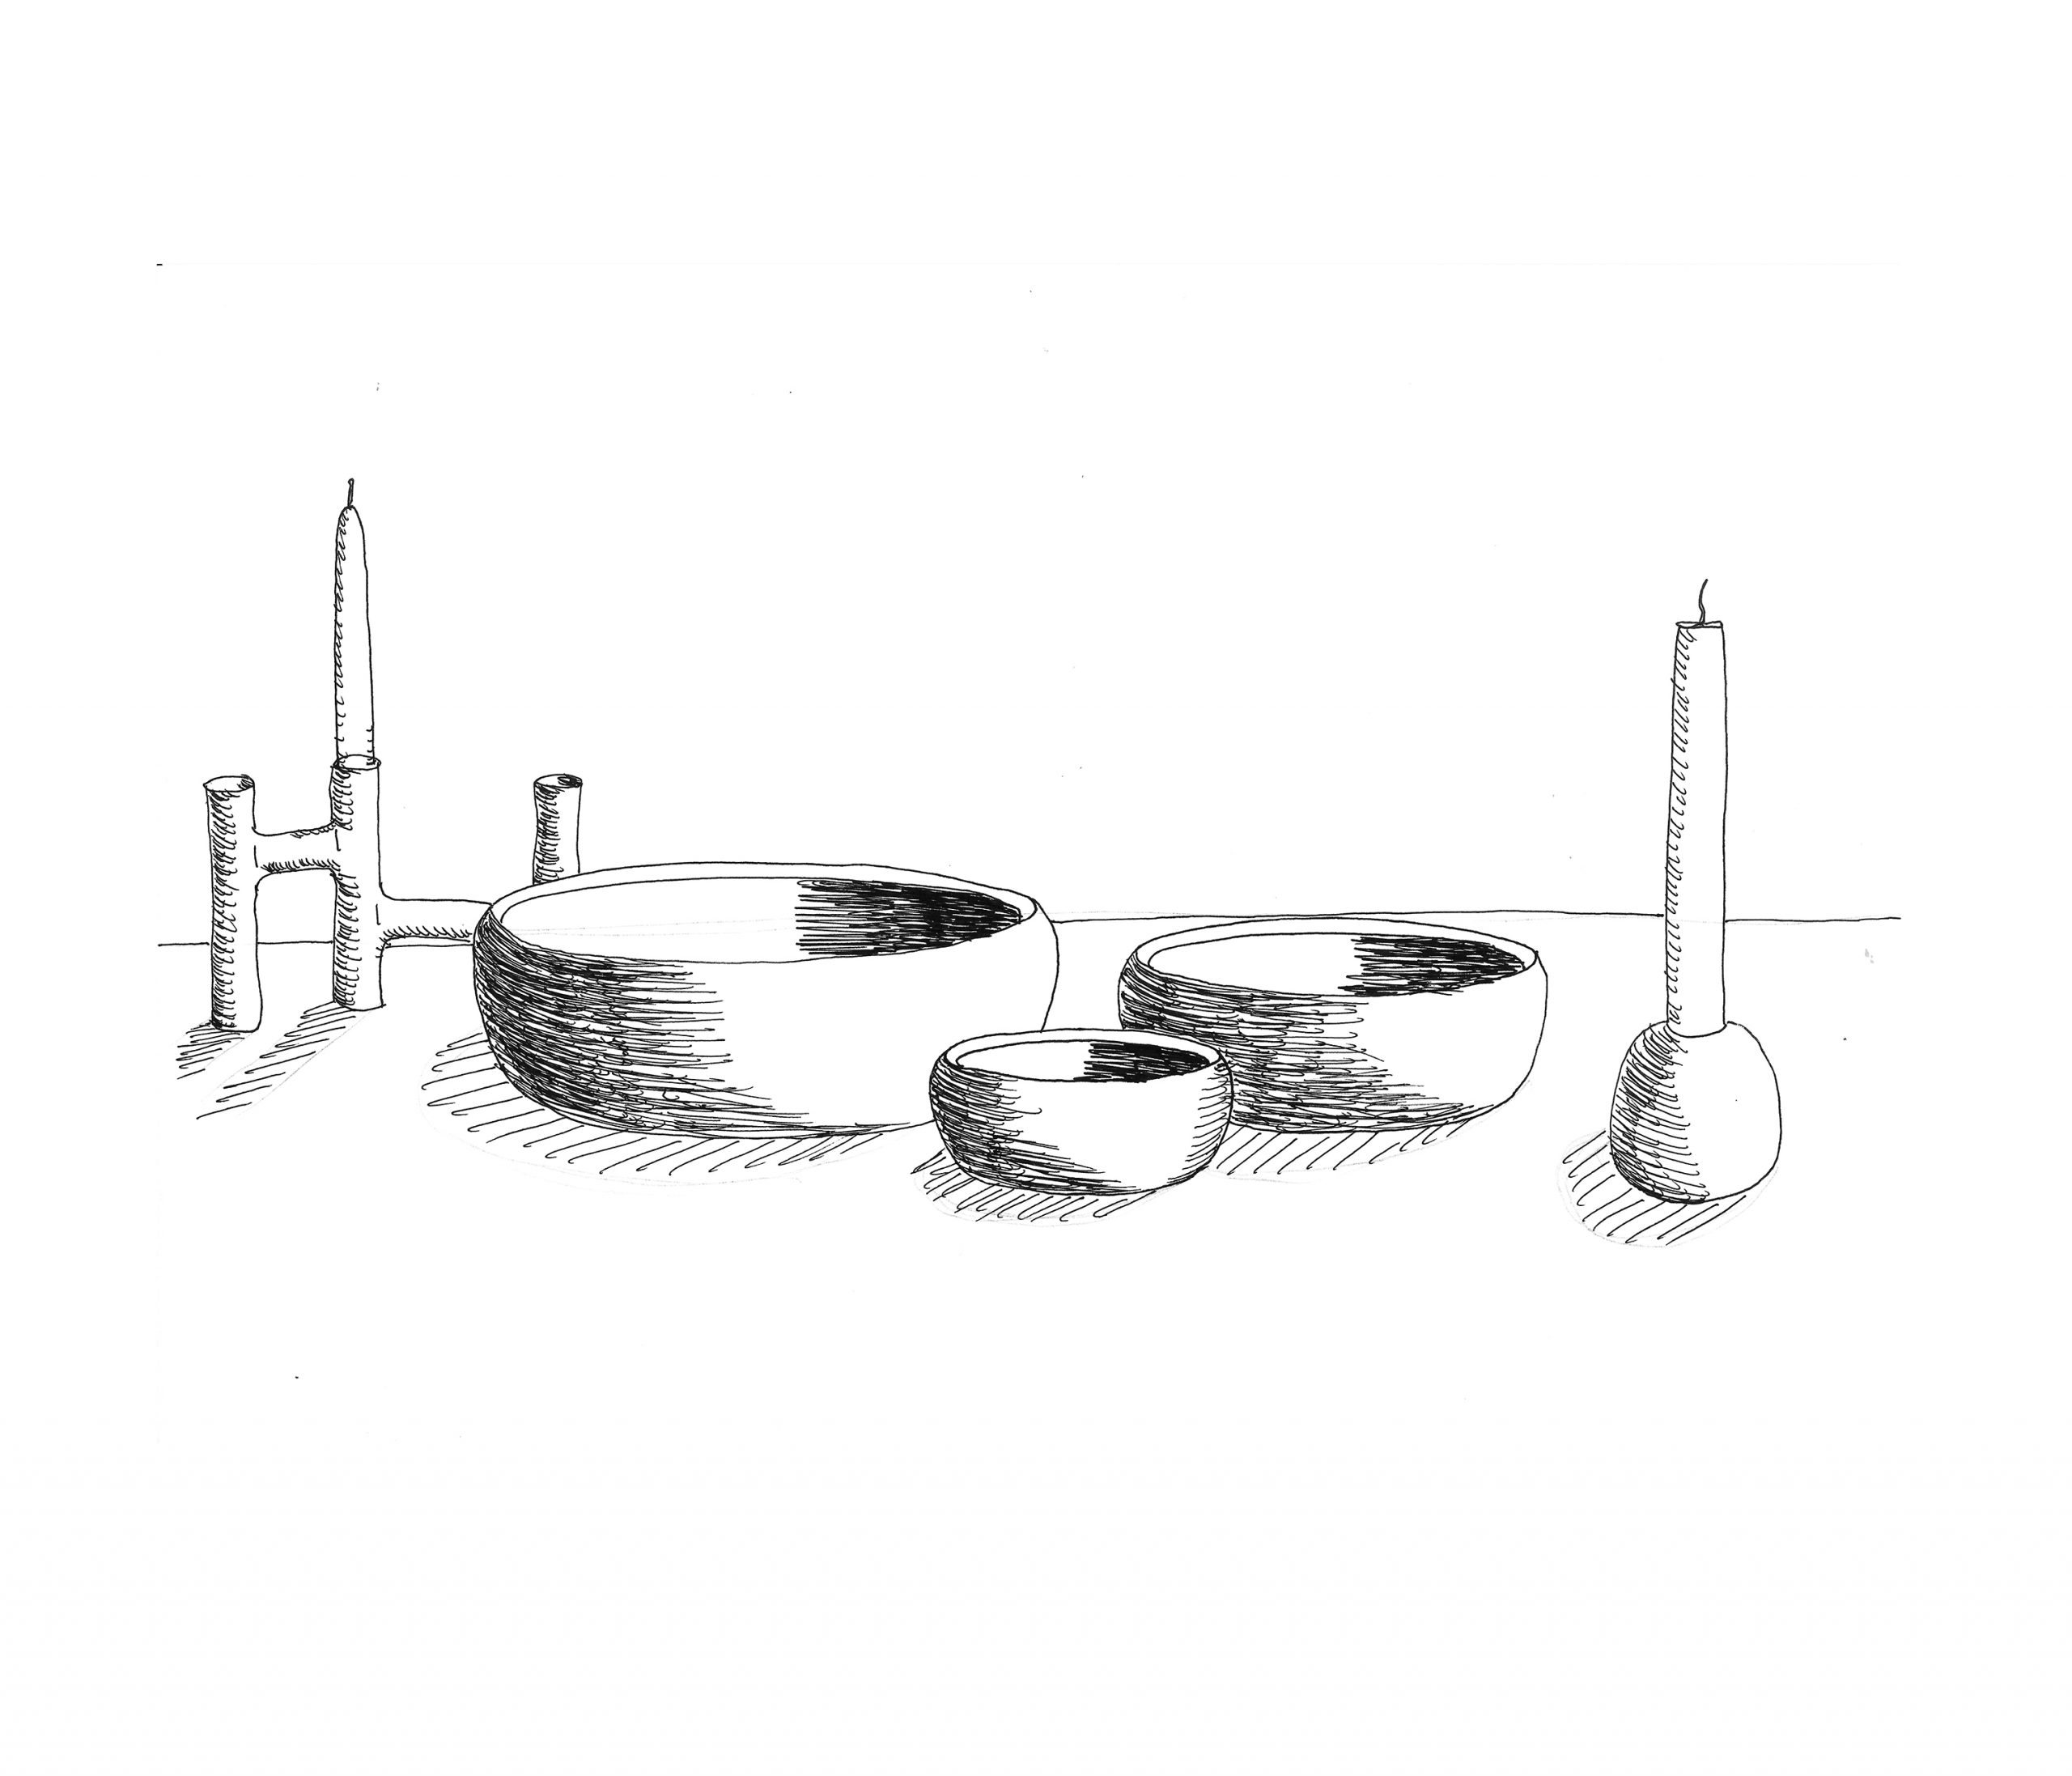 Ora sketch by Debiasi Sandri for Stelton